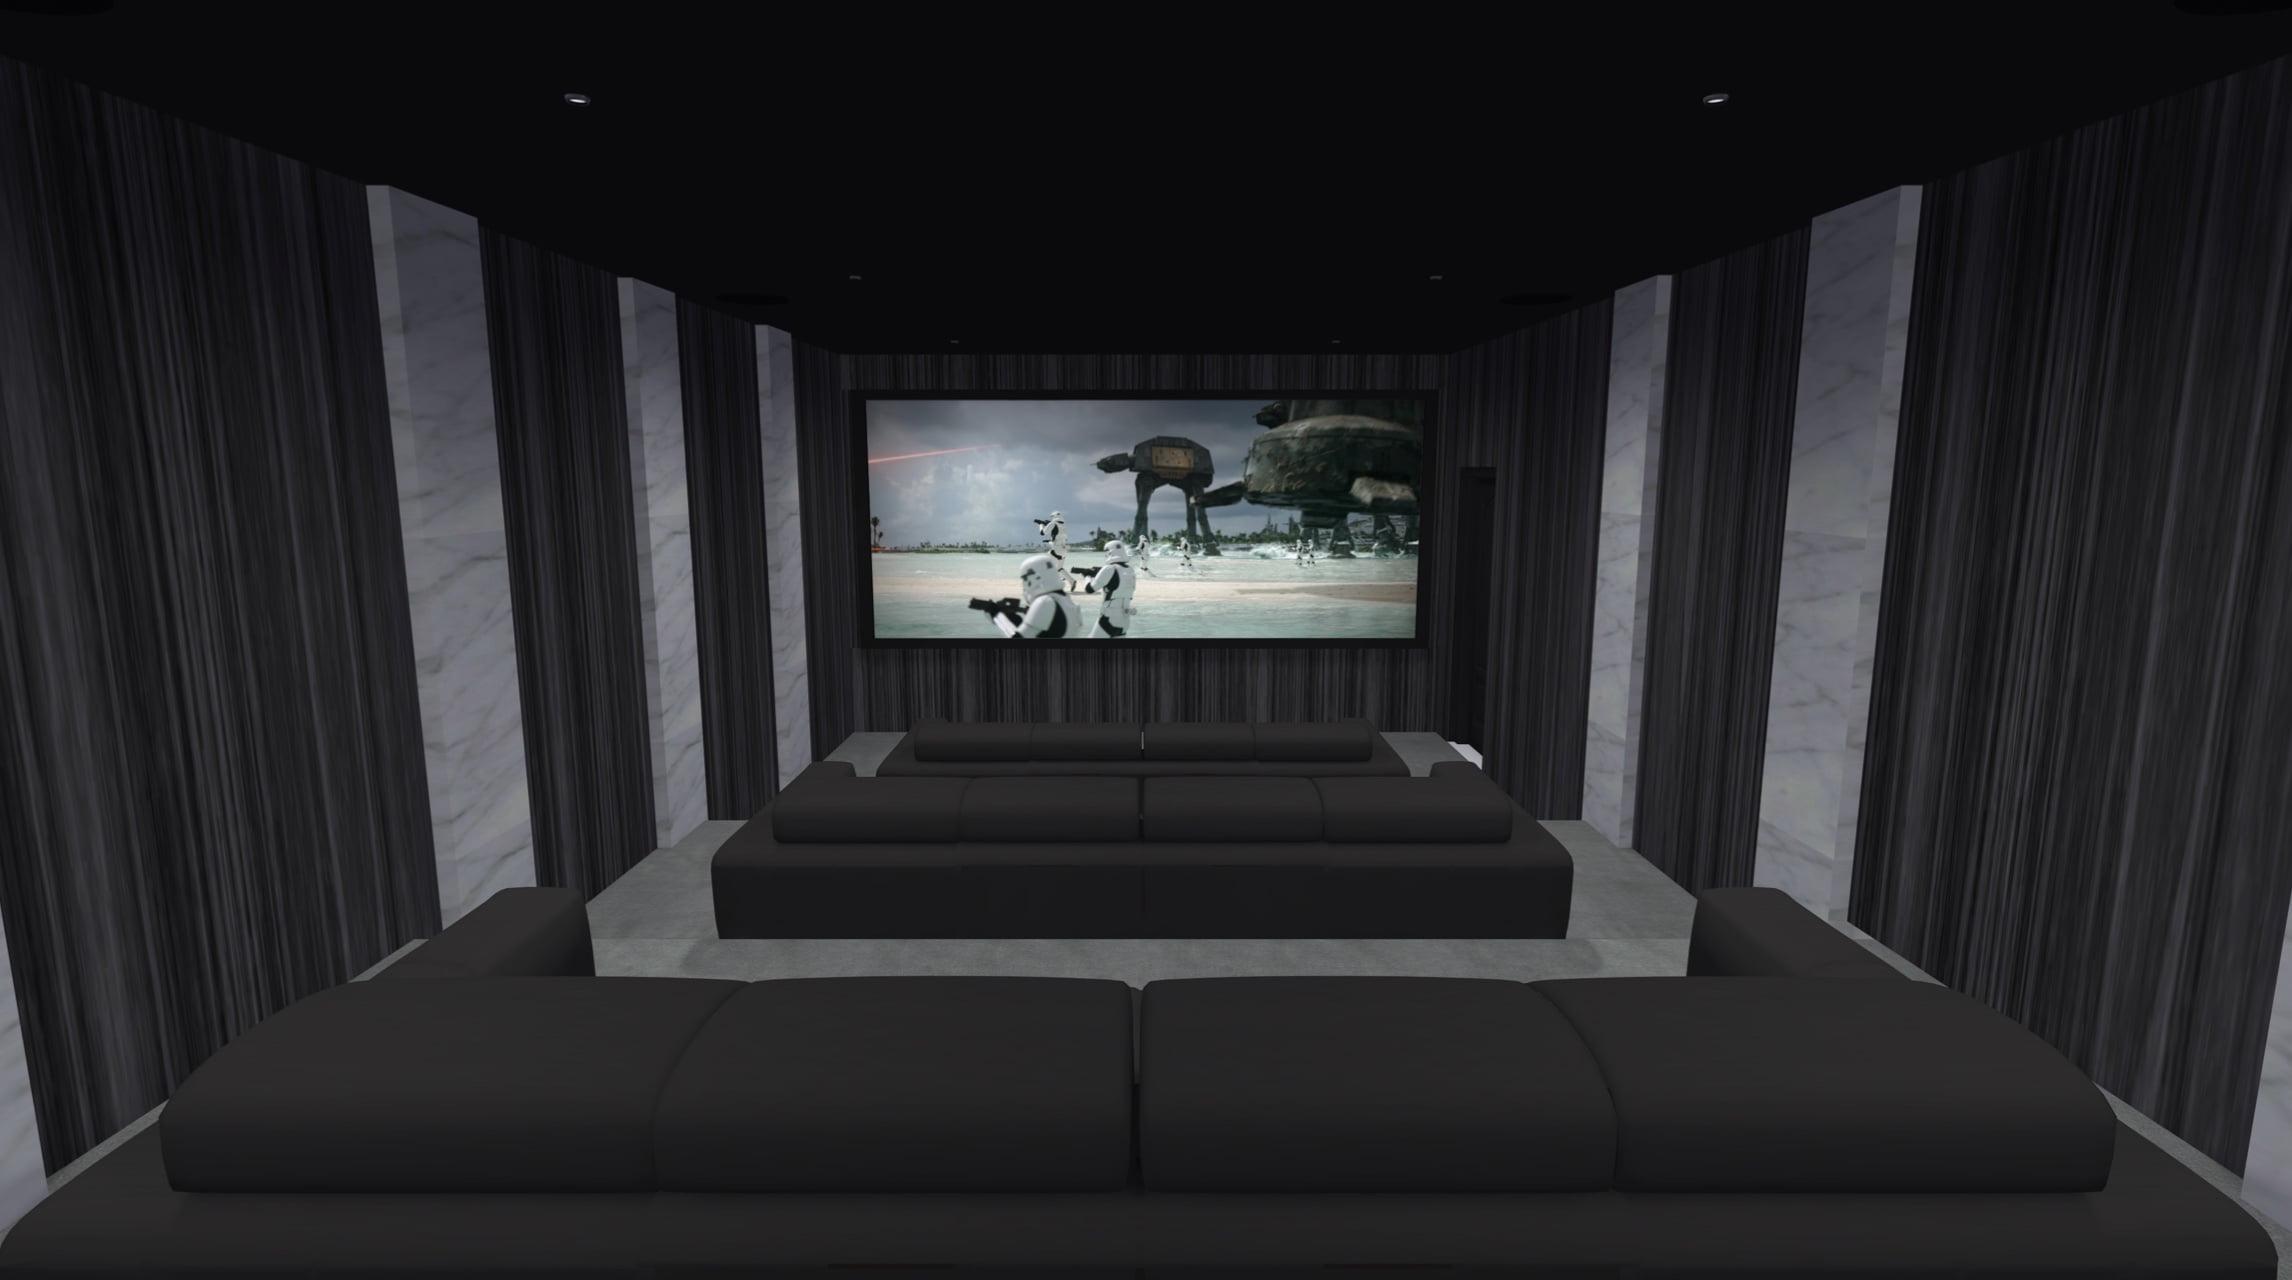 Basement dedicated home cinema room in self build property